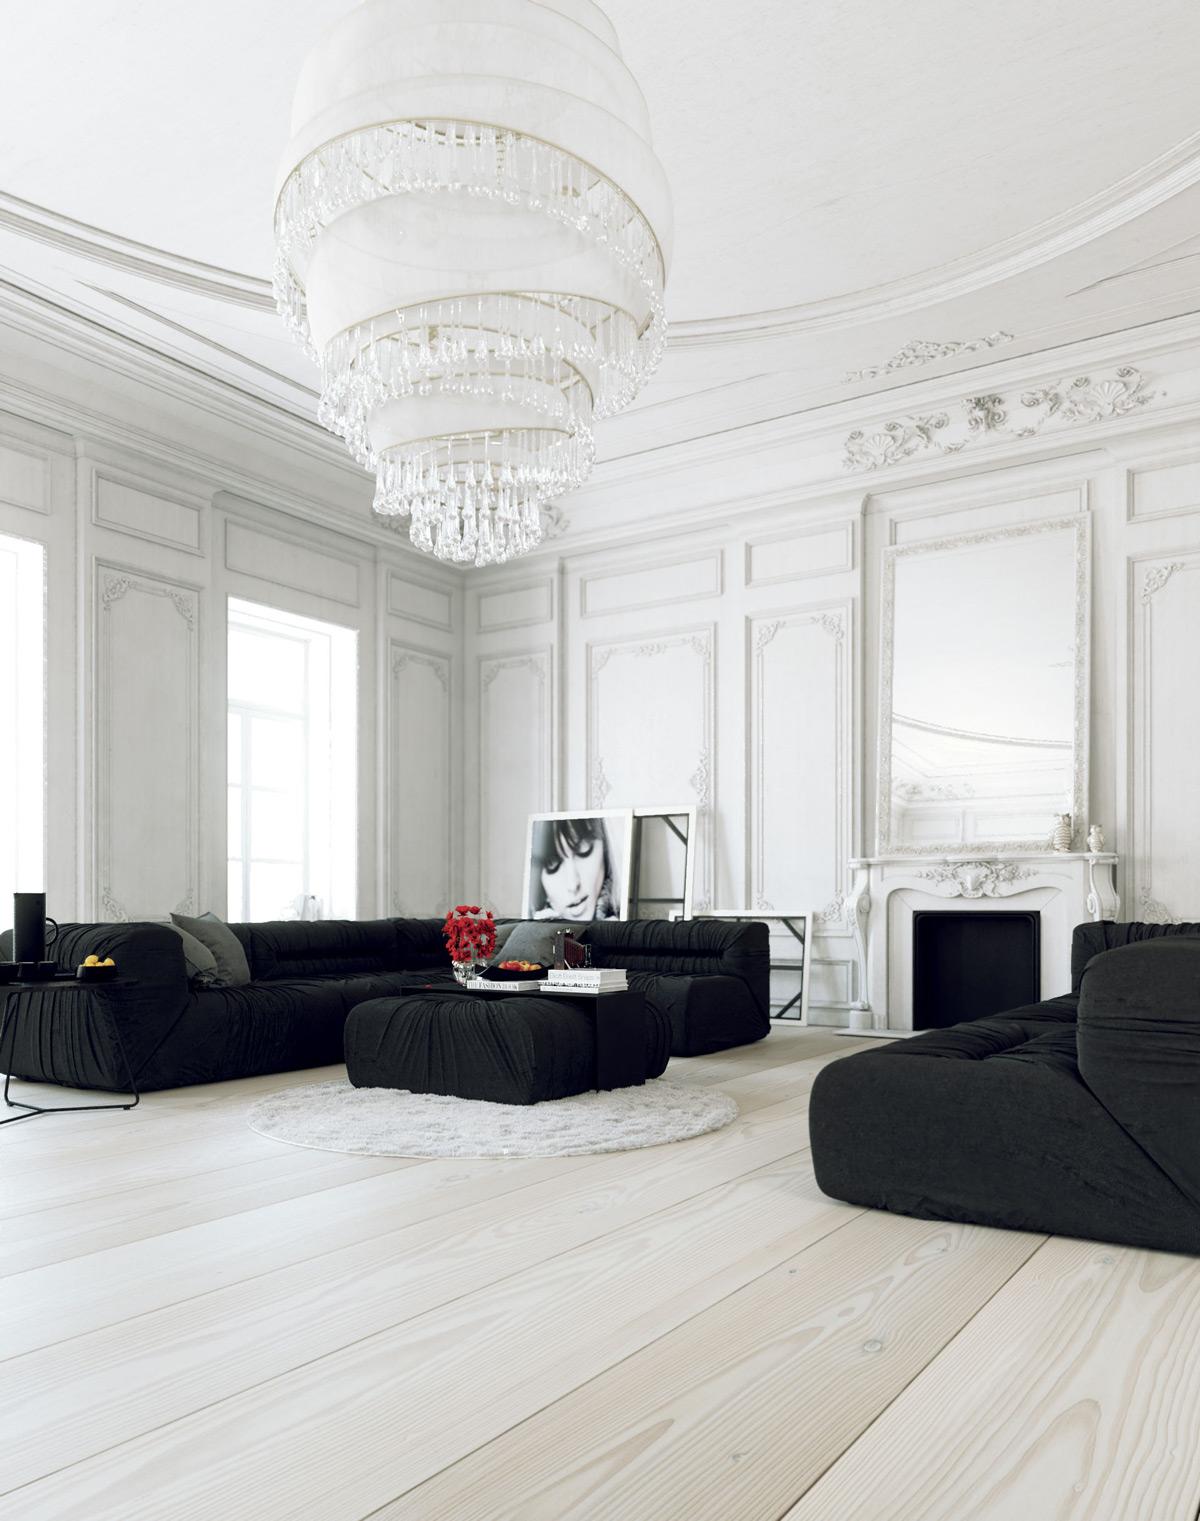 black and white living rooms modern room designs in sri lanka 30 that work their monochrome magic 3